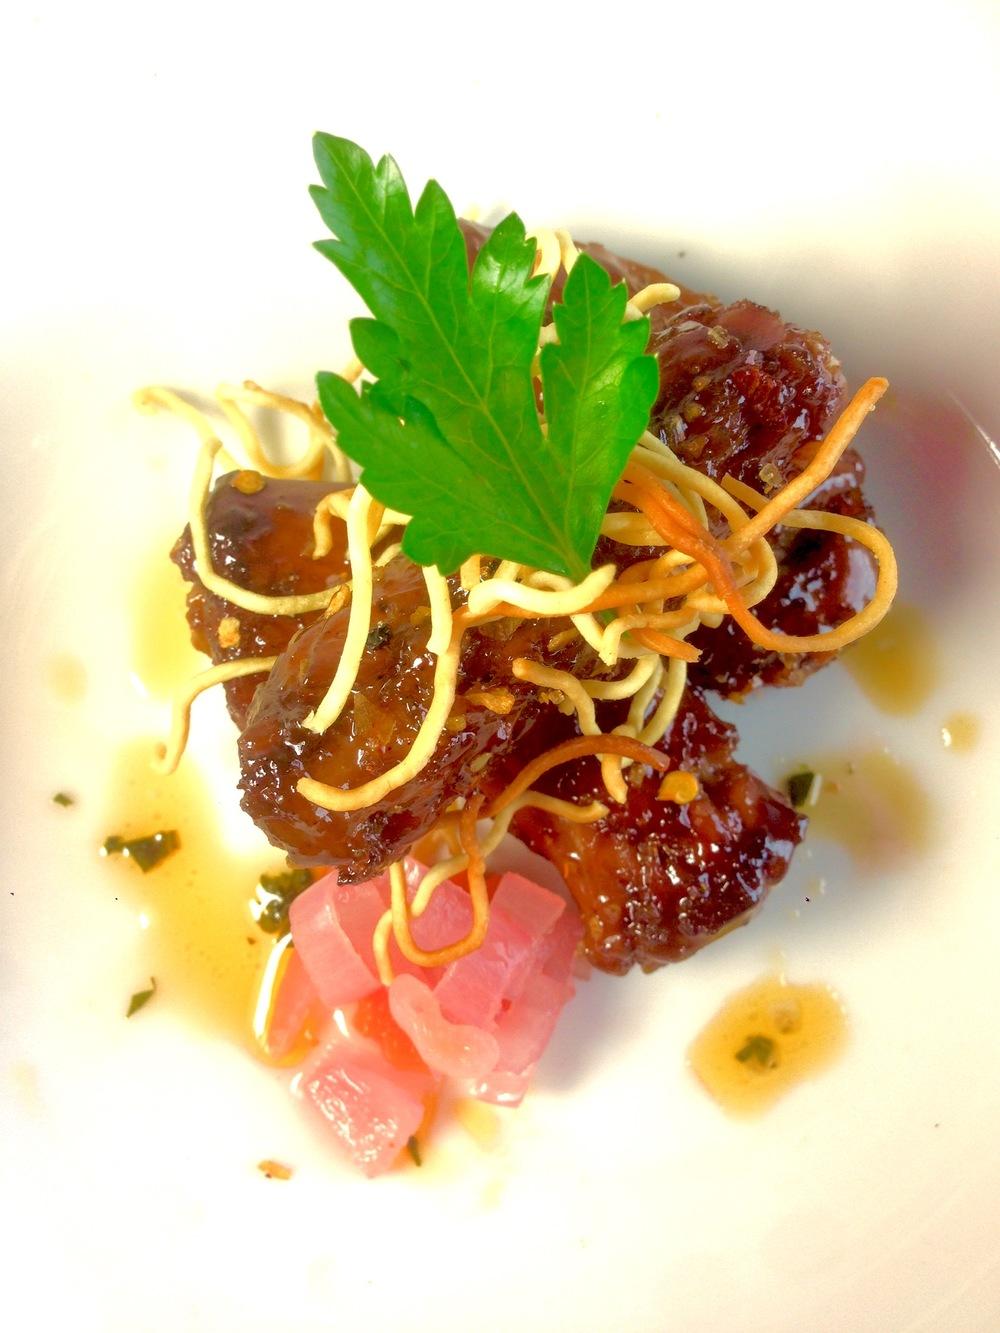 Duck Necks in tamarind and palm sugar glaze, habanero salt, pickled shallots